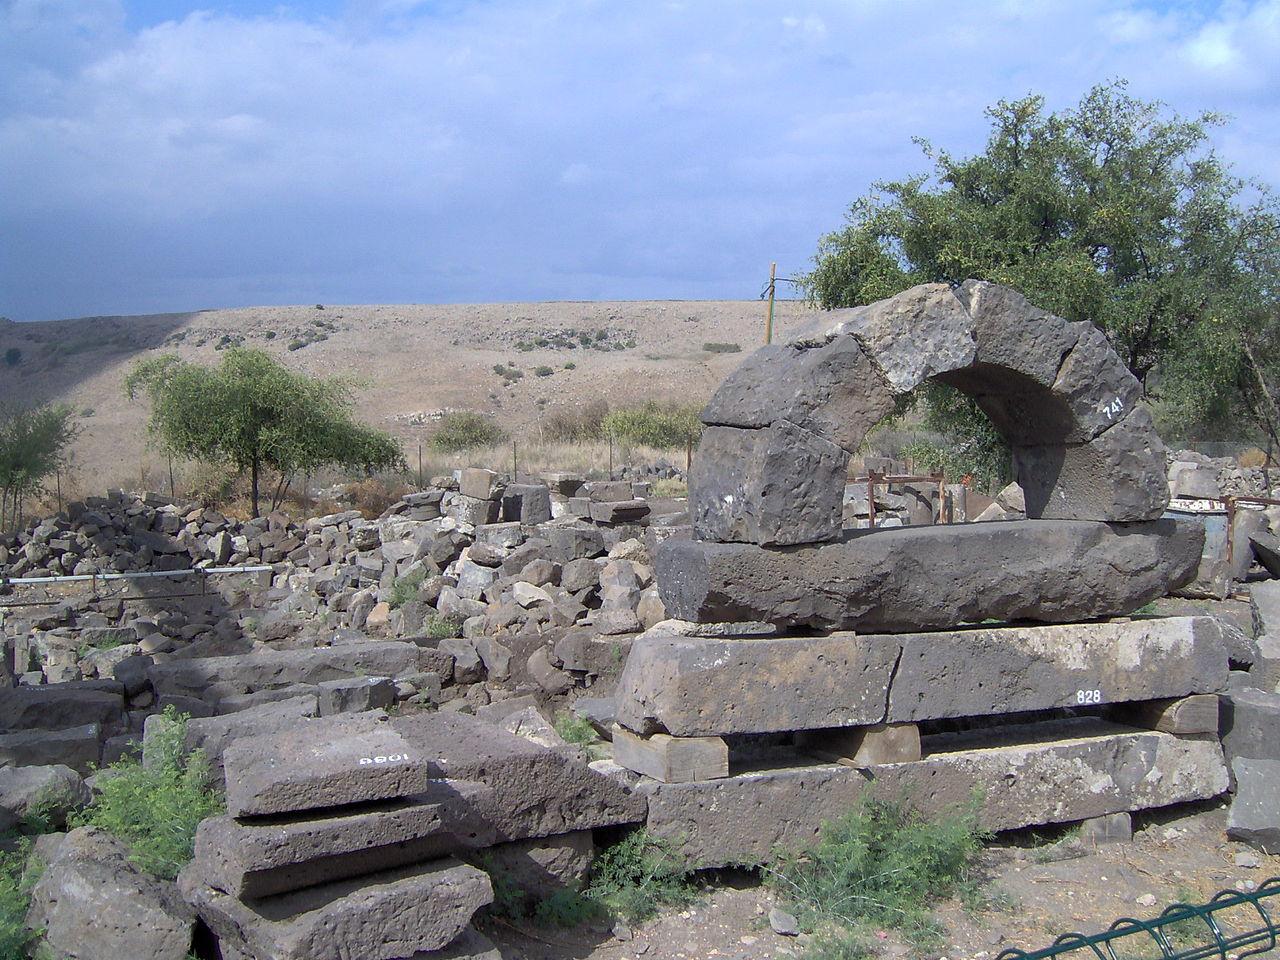 Развалины Ум-эль-Кантир, Голанские высоты